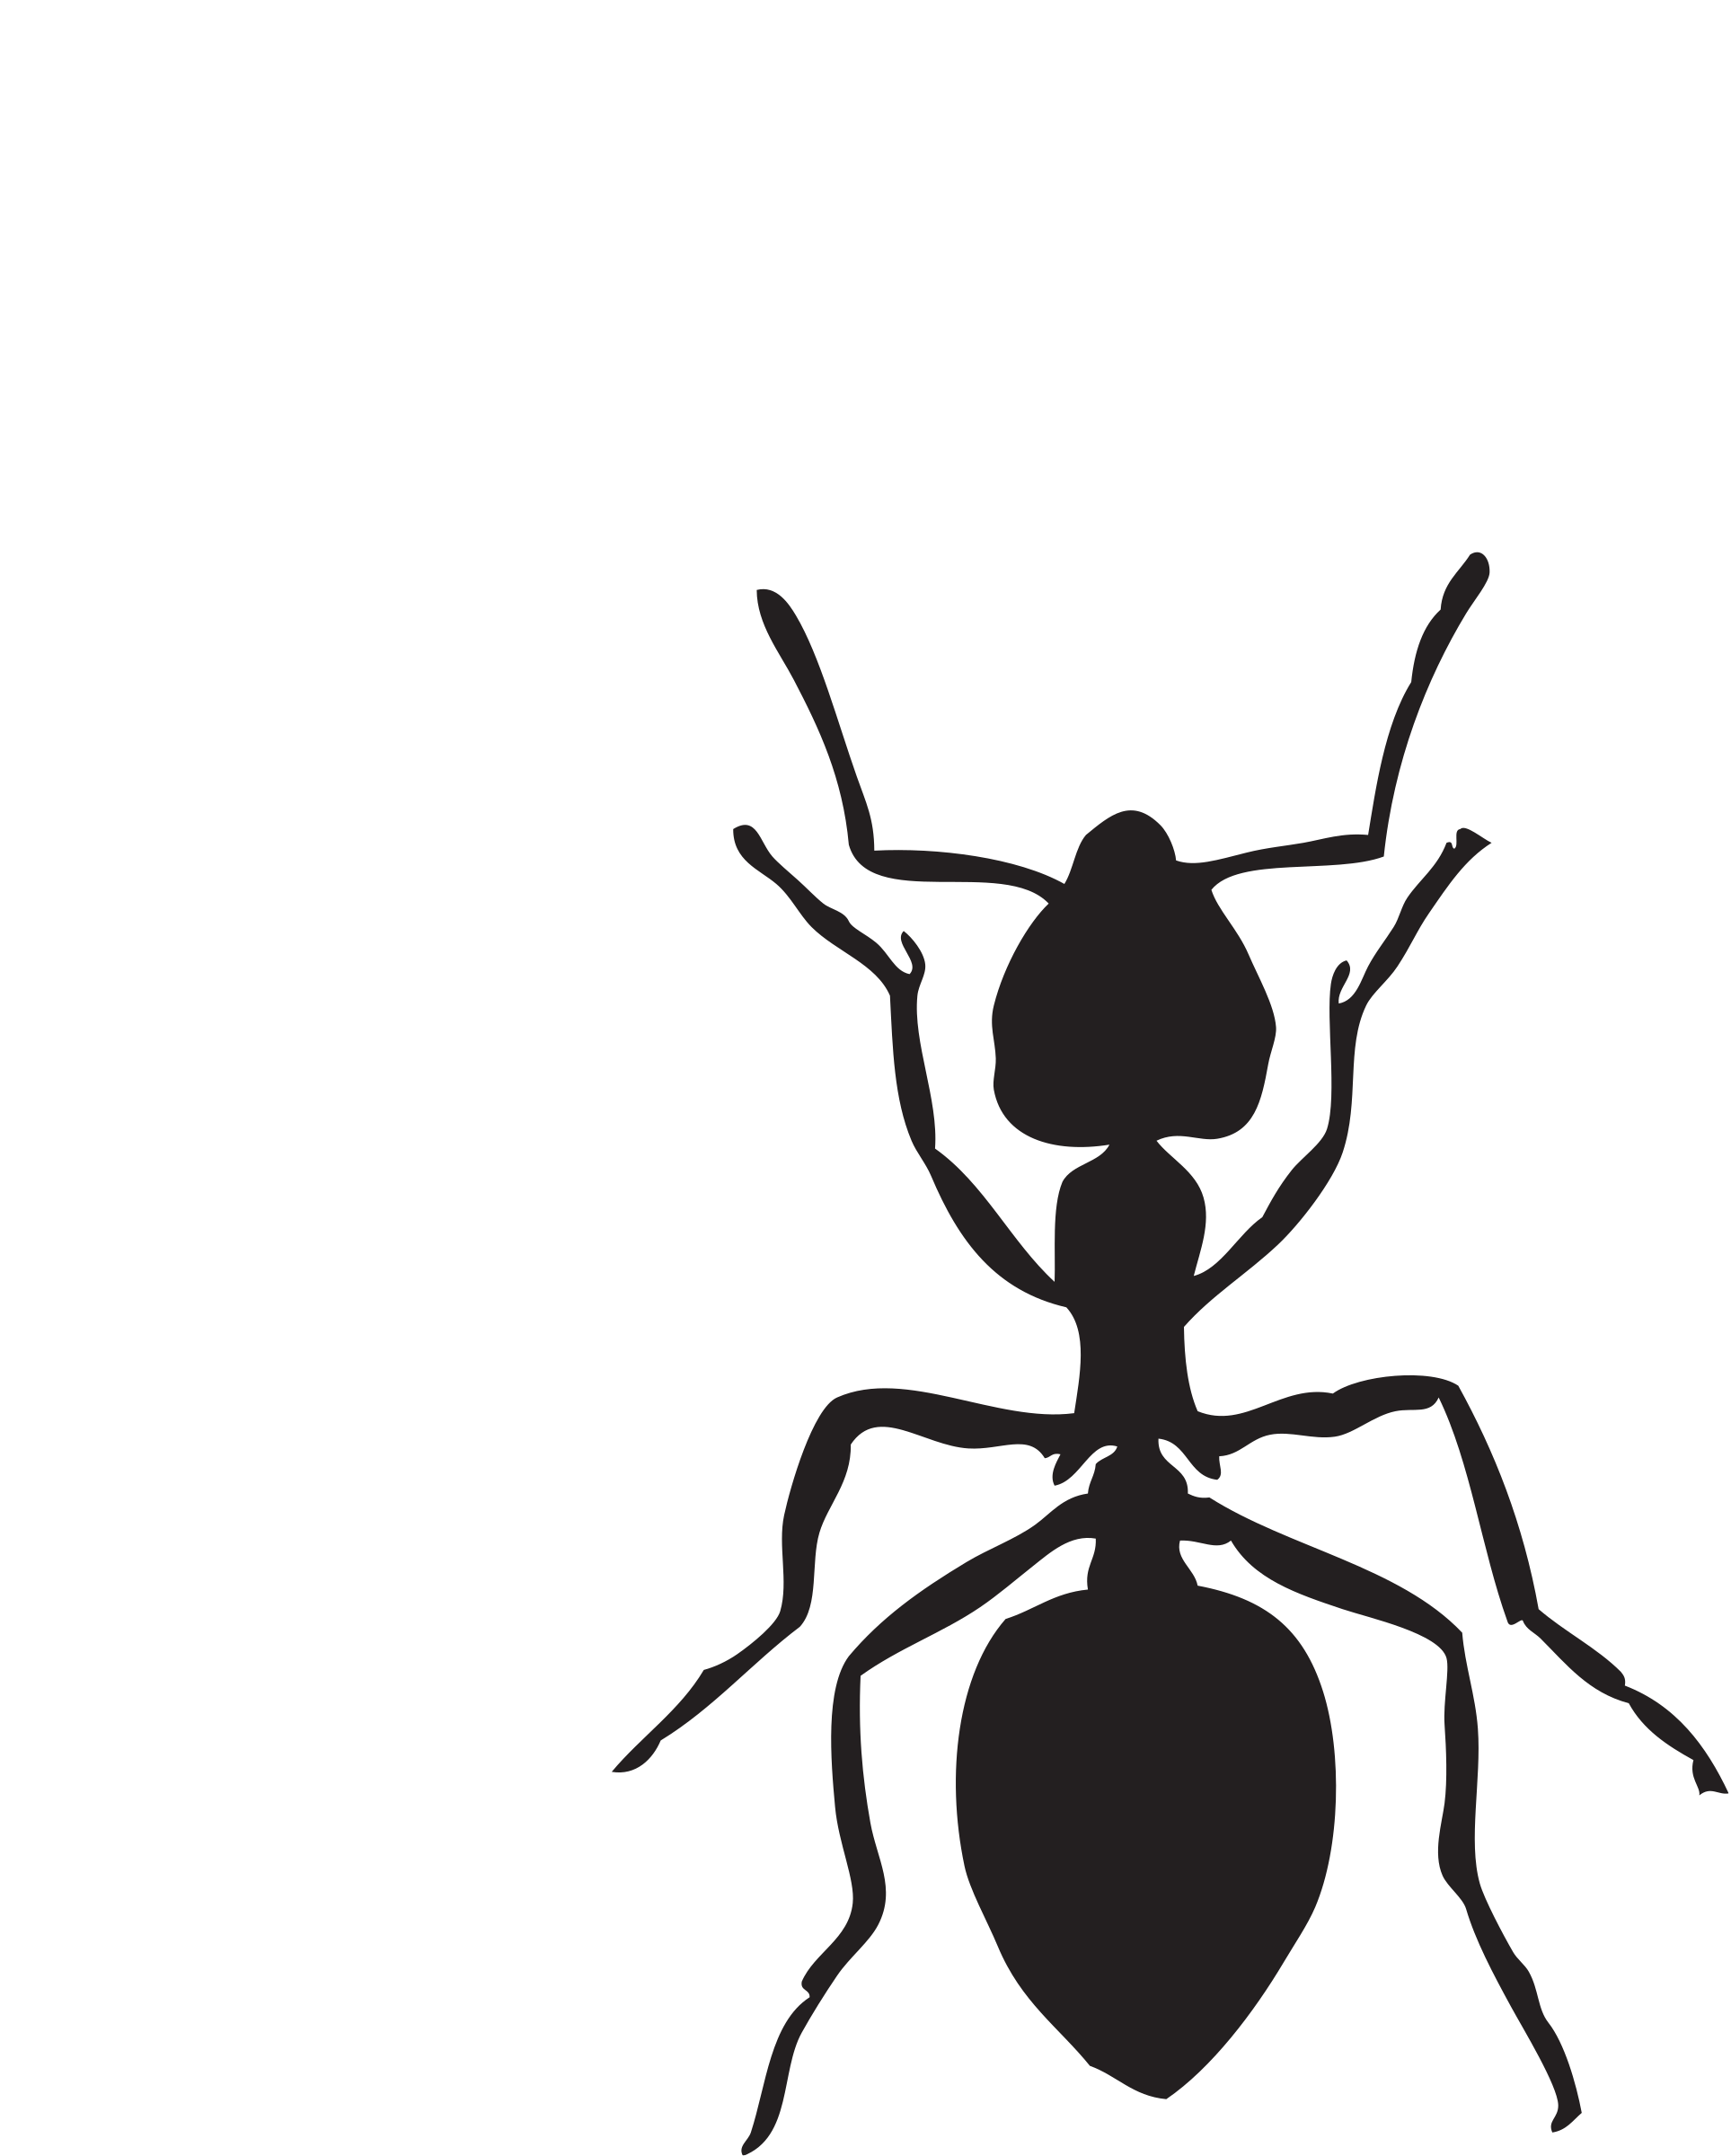 Acrobat ant big image. Ants clipart body